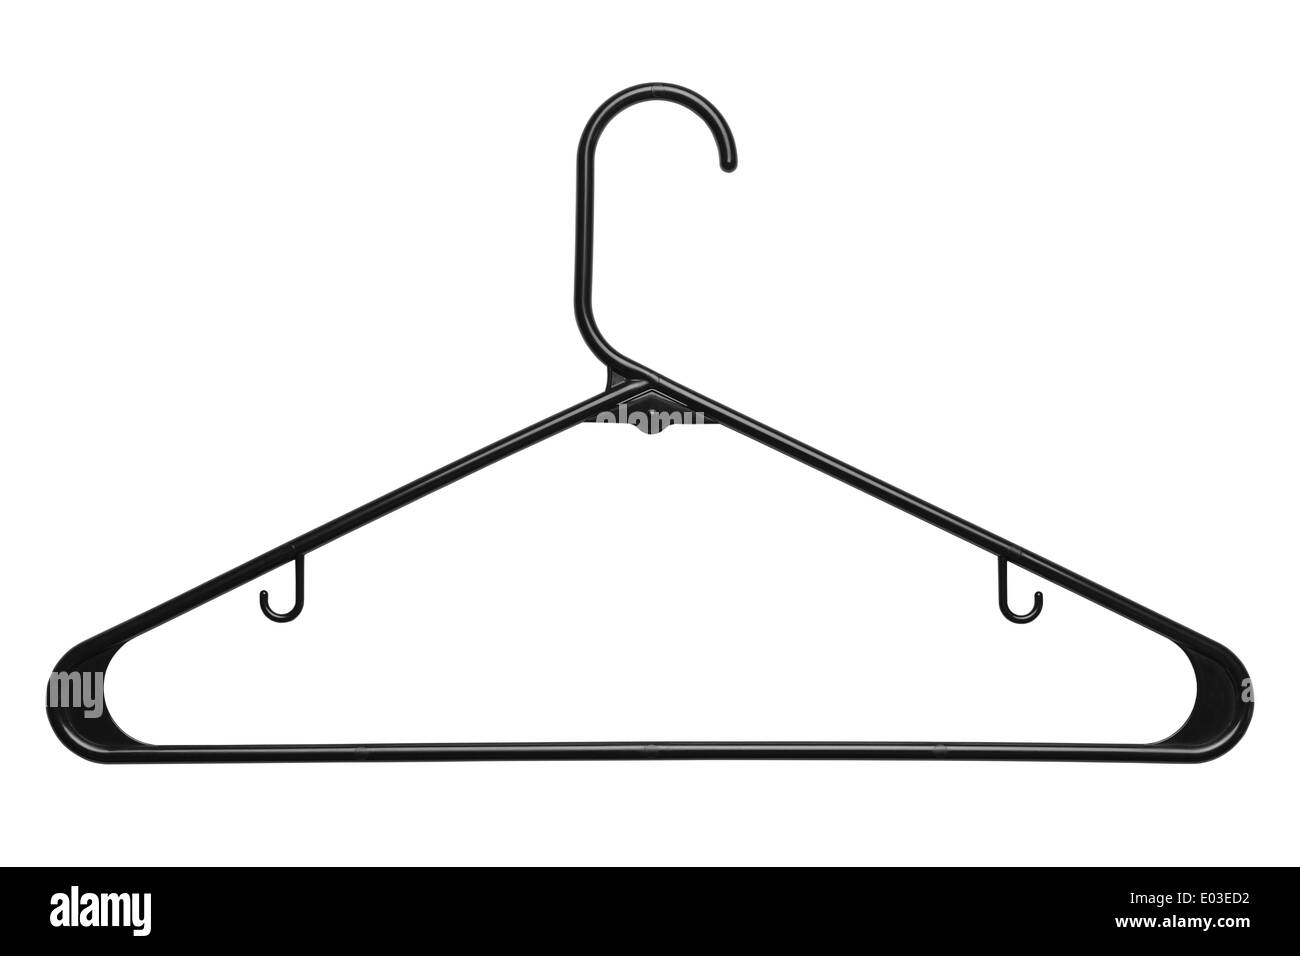 Schwarzer Kunststoff Kleiderbügel Isolated on White Background. Stockbild